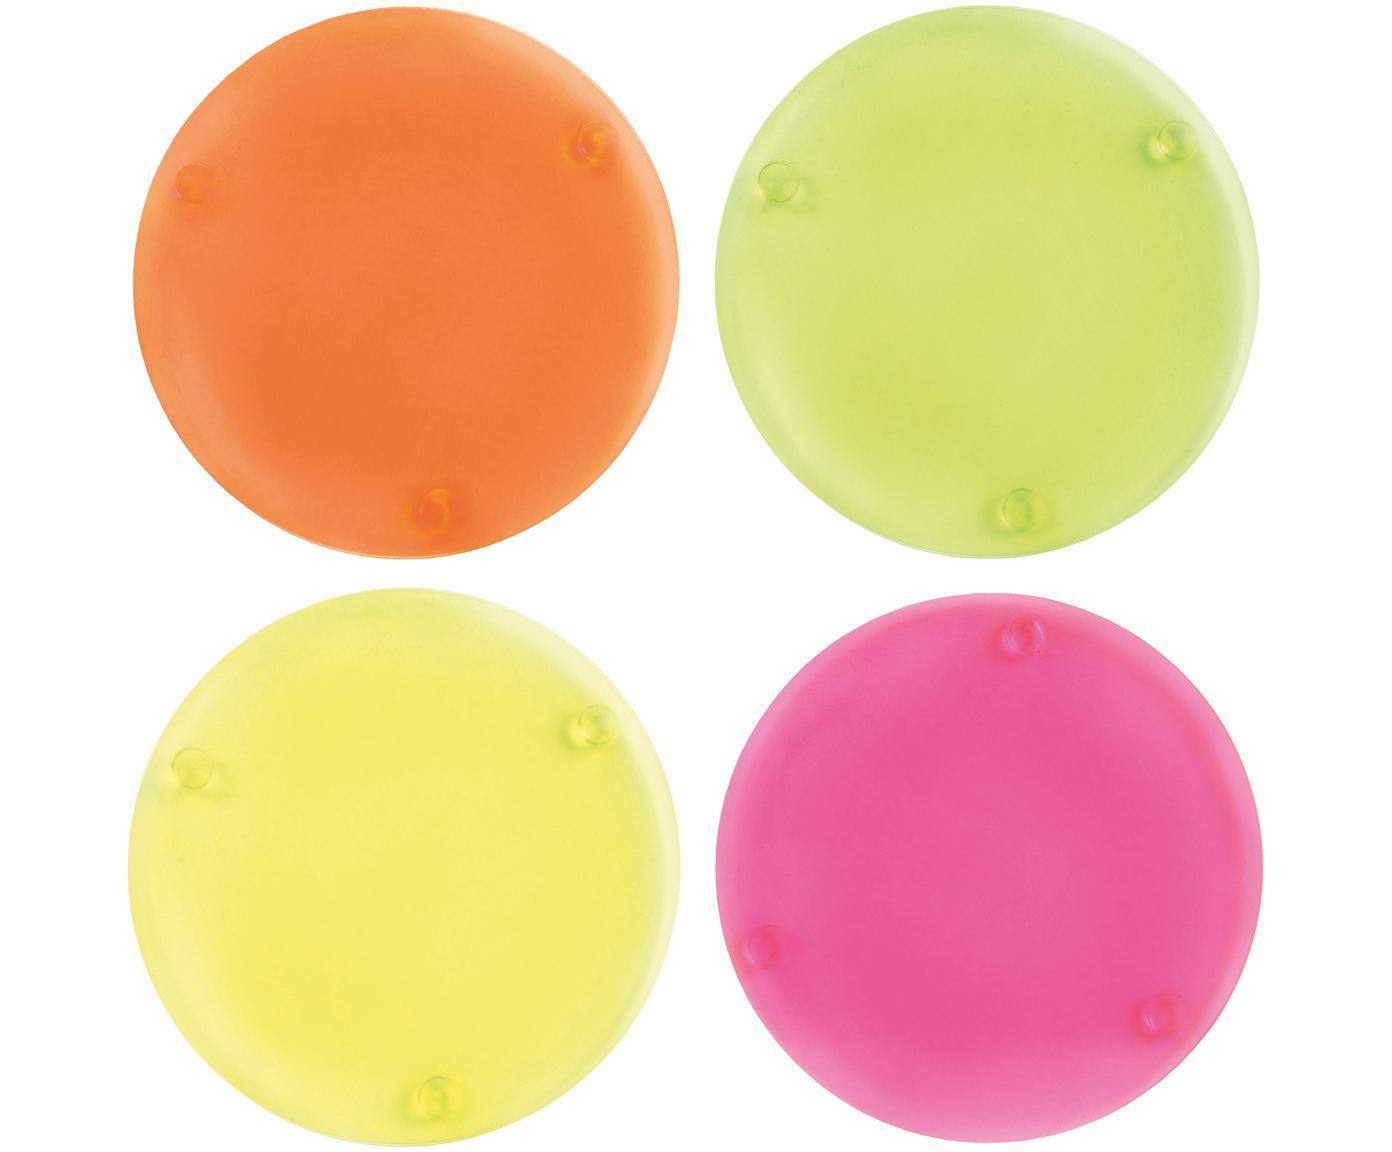 Neonfarbene Acryl-Untersetzer Nena, 4er-Set, Acryl, Gelb, Grün, Orange, Rosa, Ø 10 cm